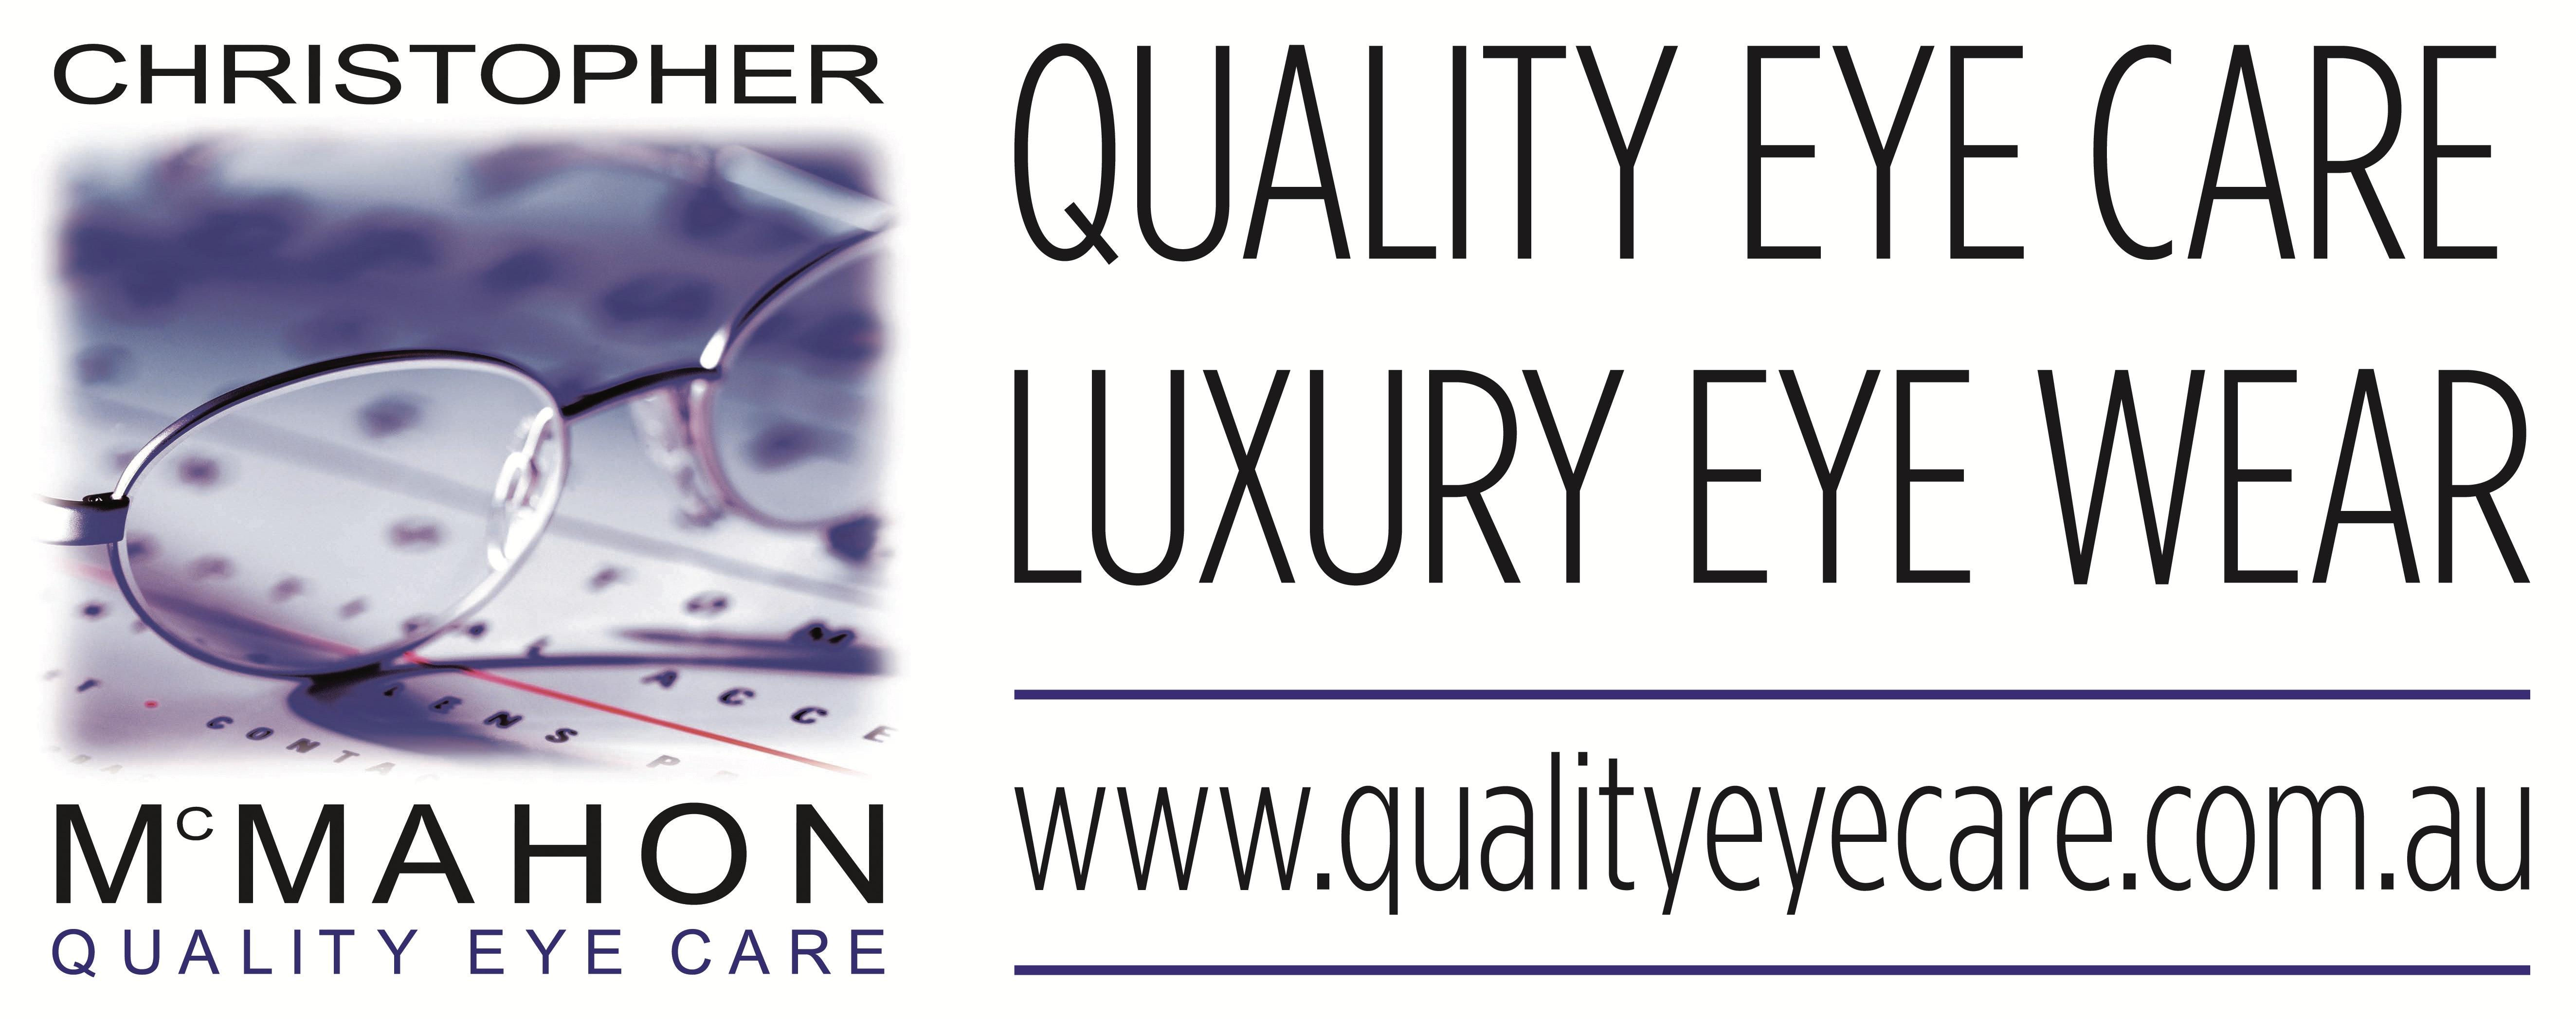 Christopher McMahon Quality Eye Care - Runaway Bay